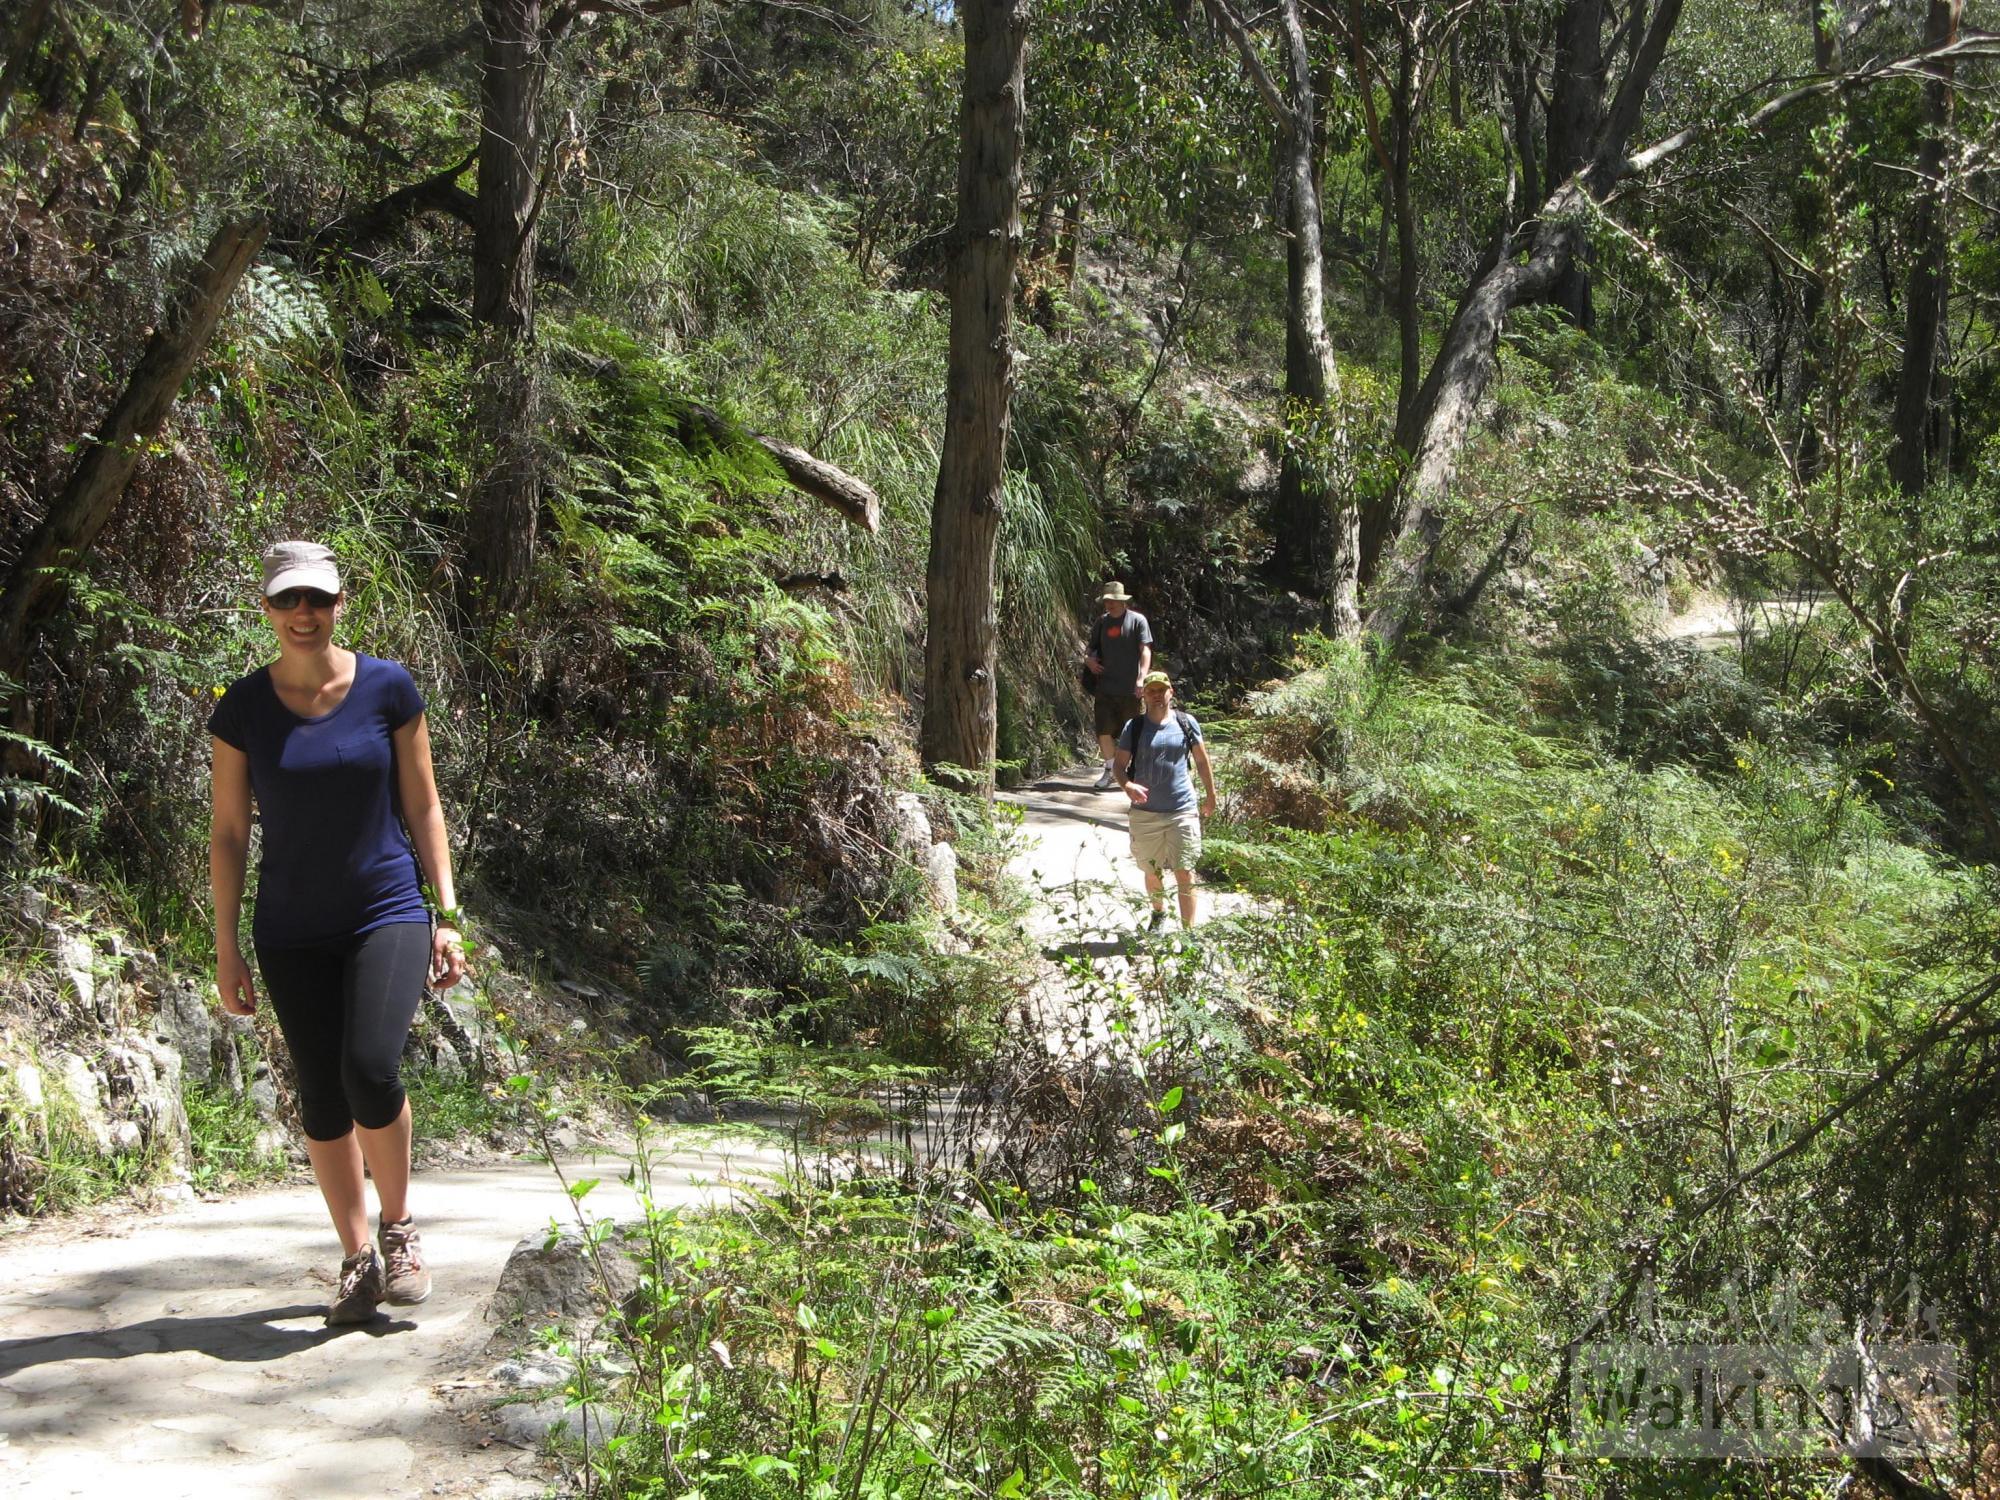 Mount lofty toowoomba